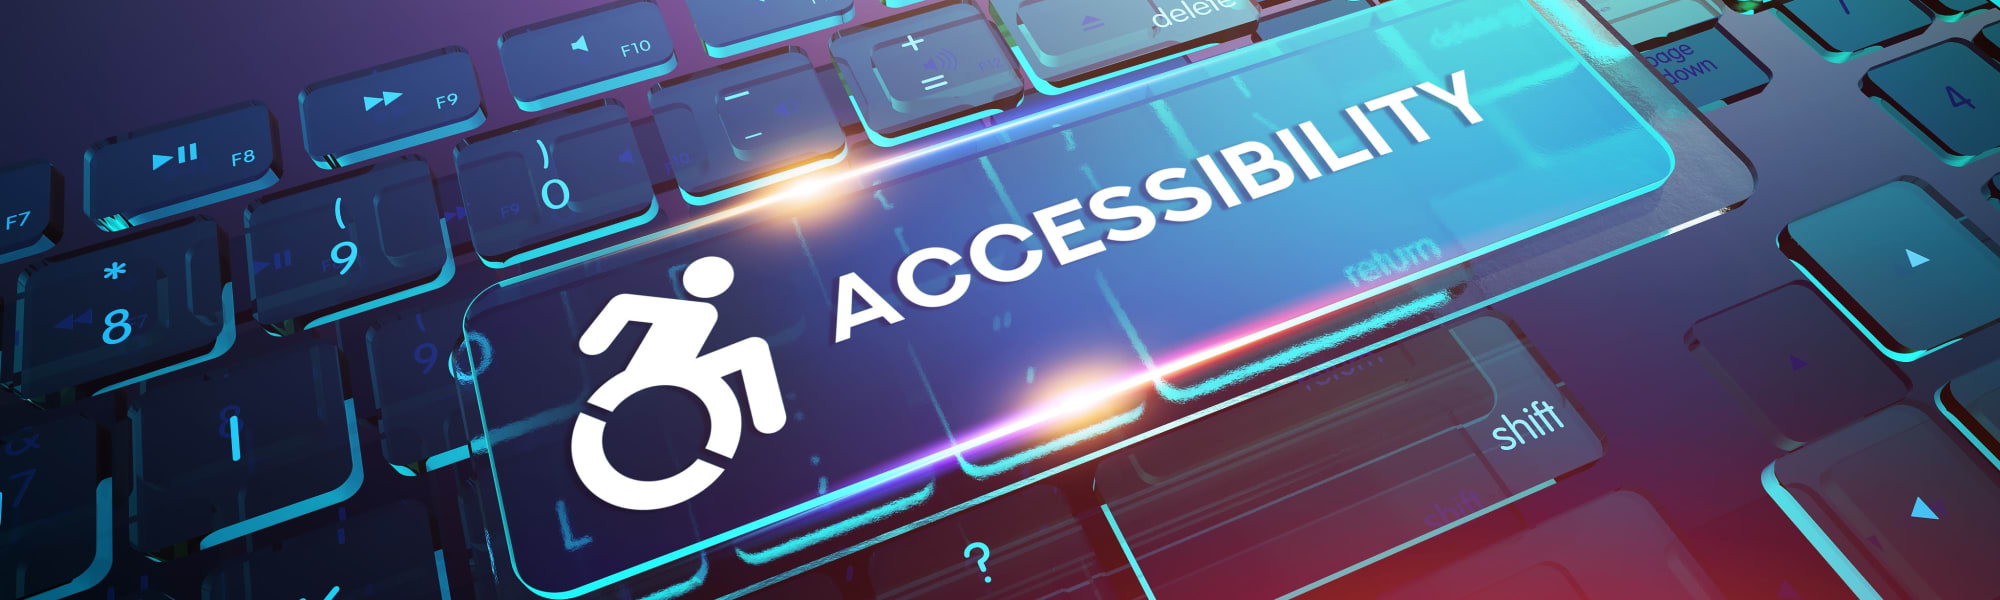 Accessibility policy for Olympus Steelyard in Chandler, Arizona